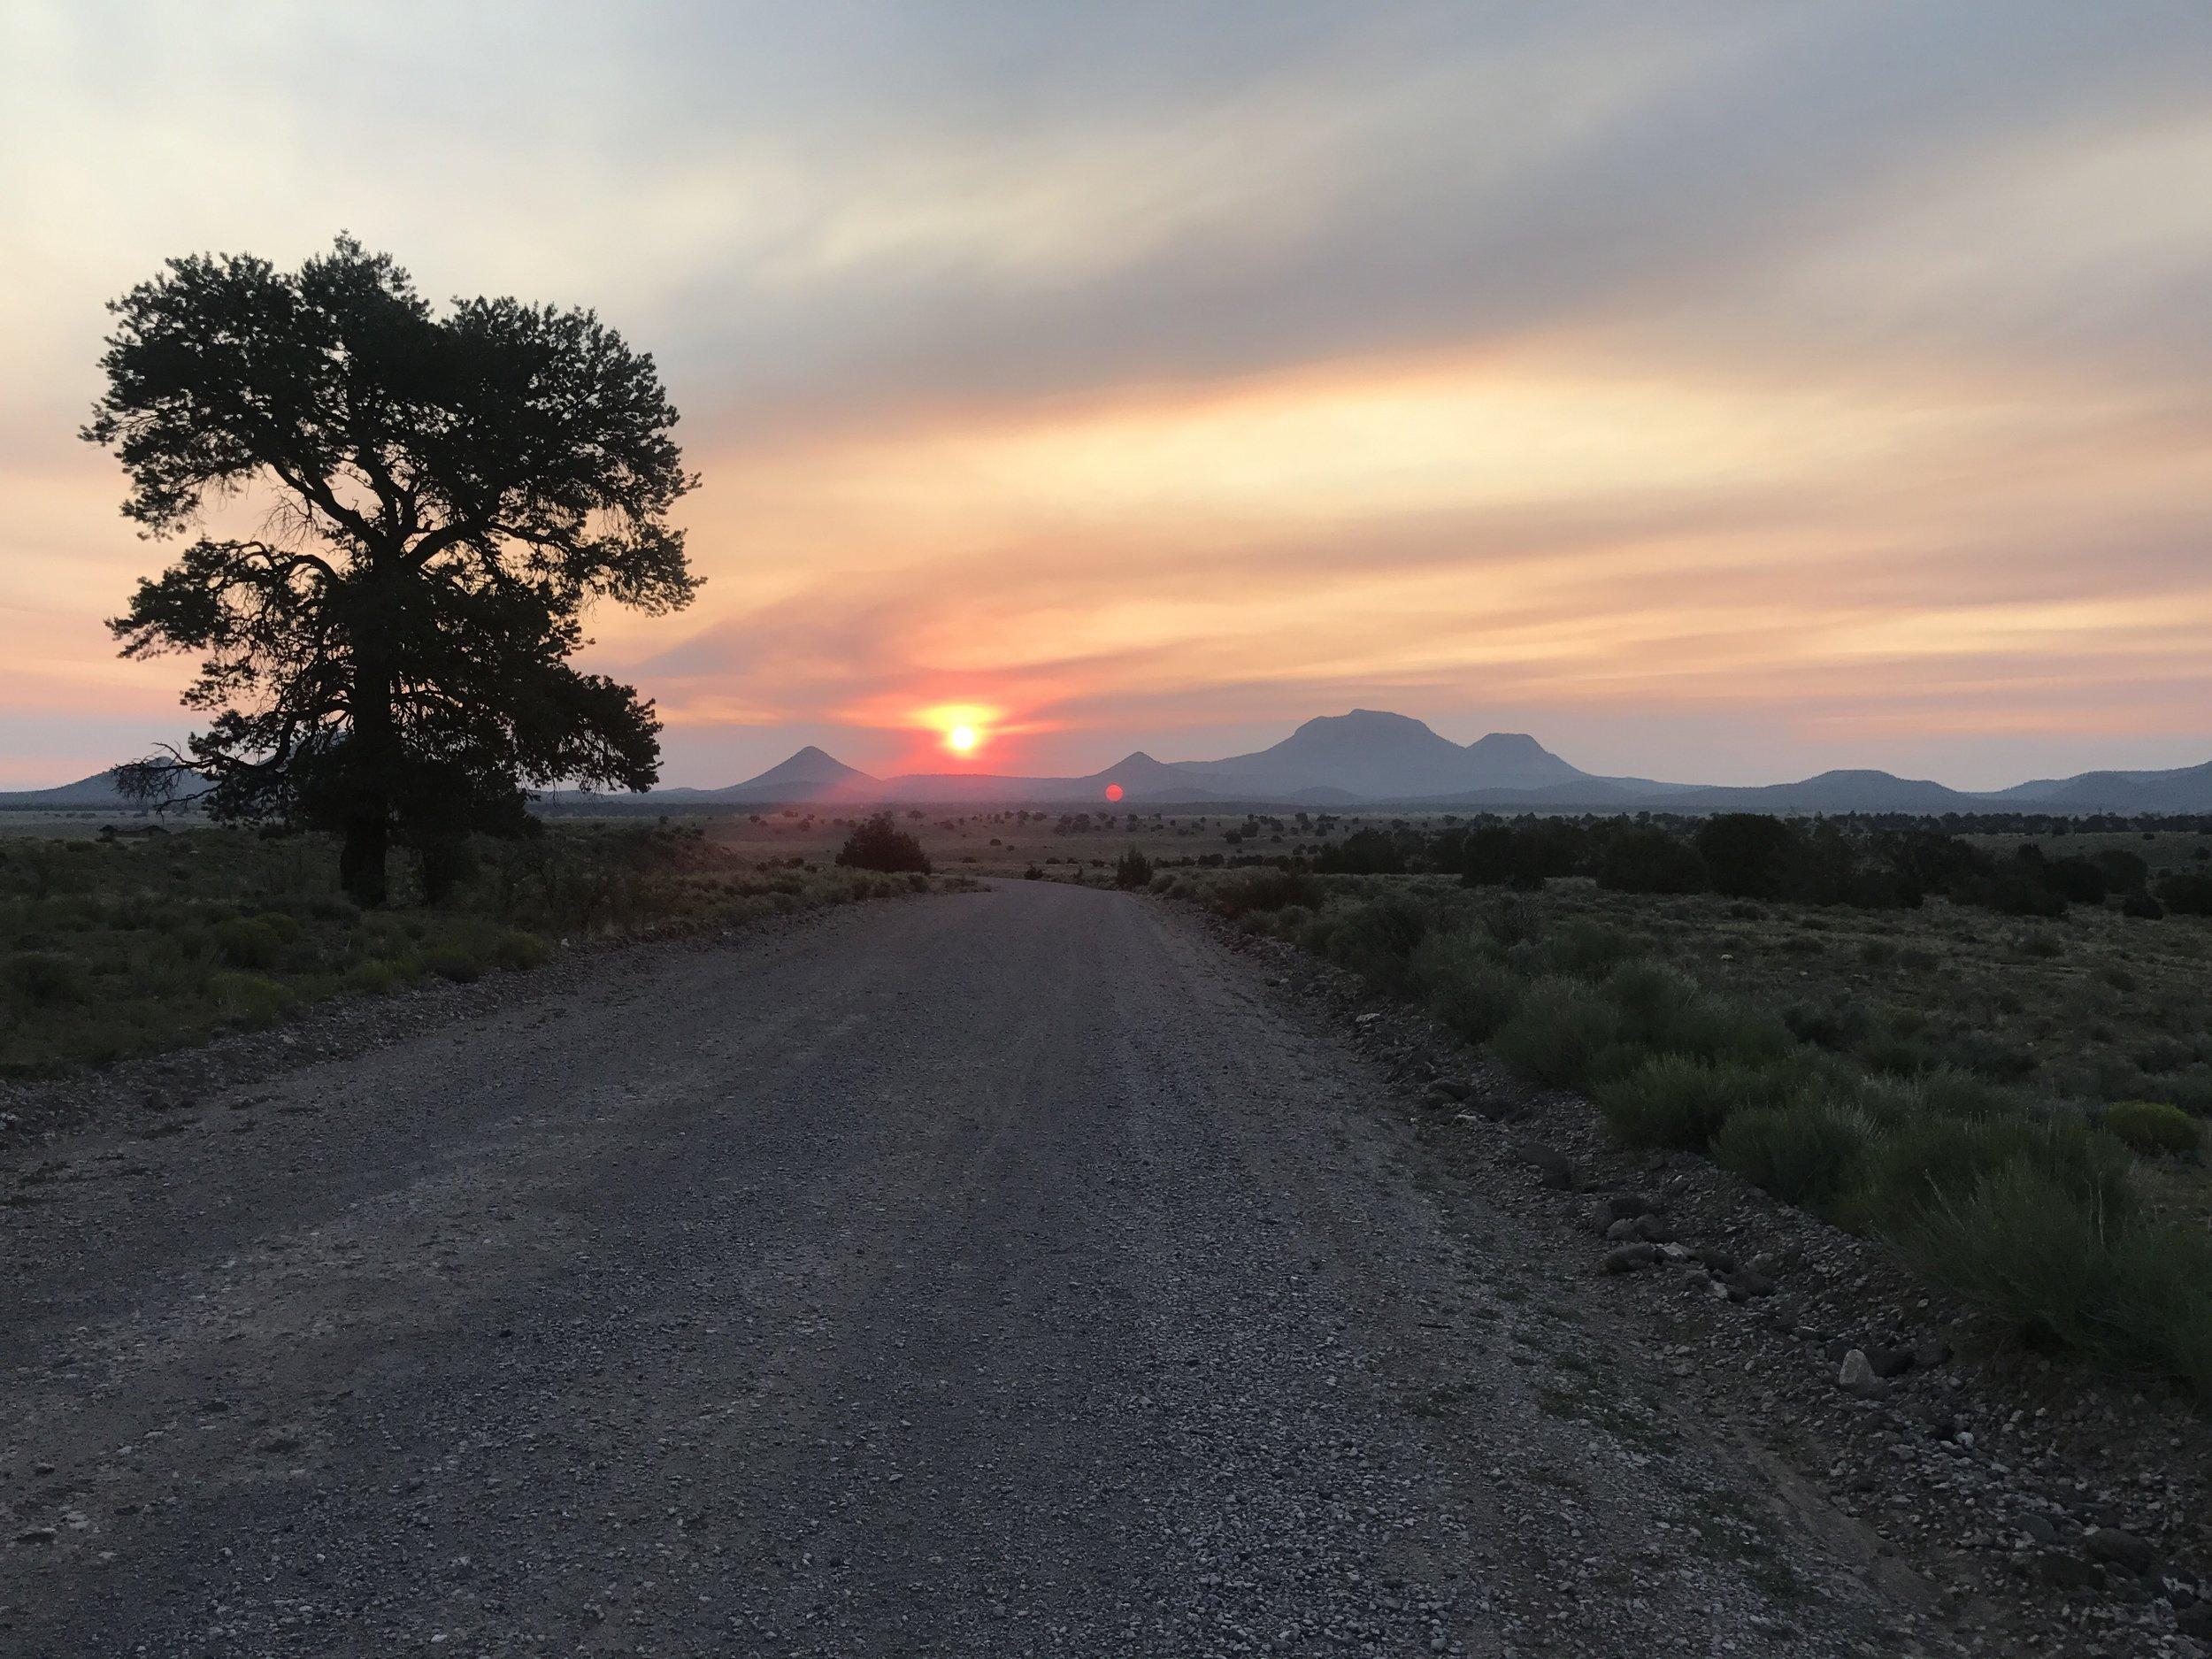 New Mexico surprises